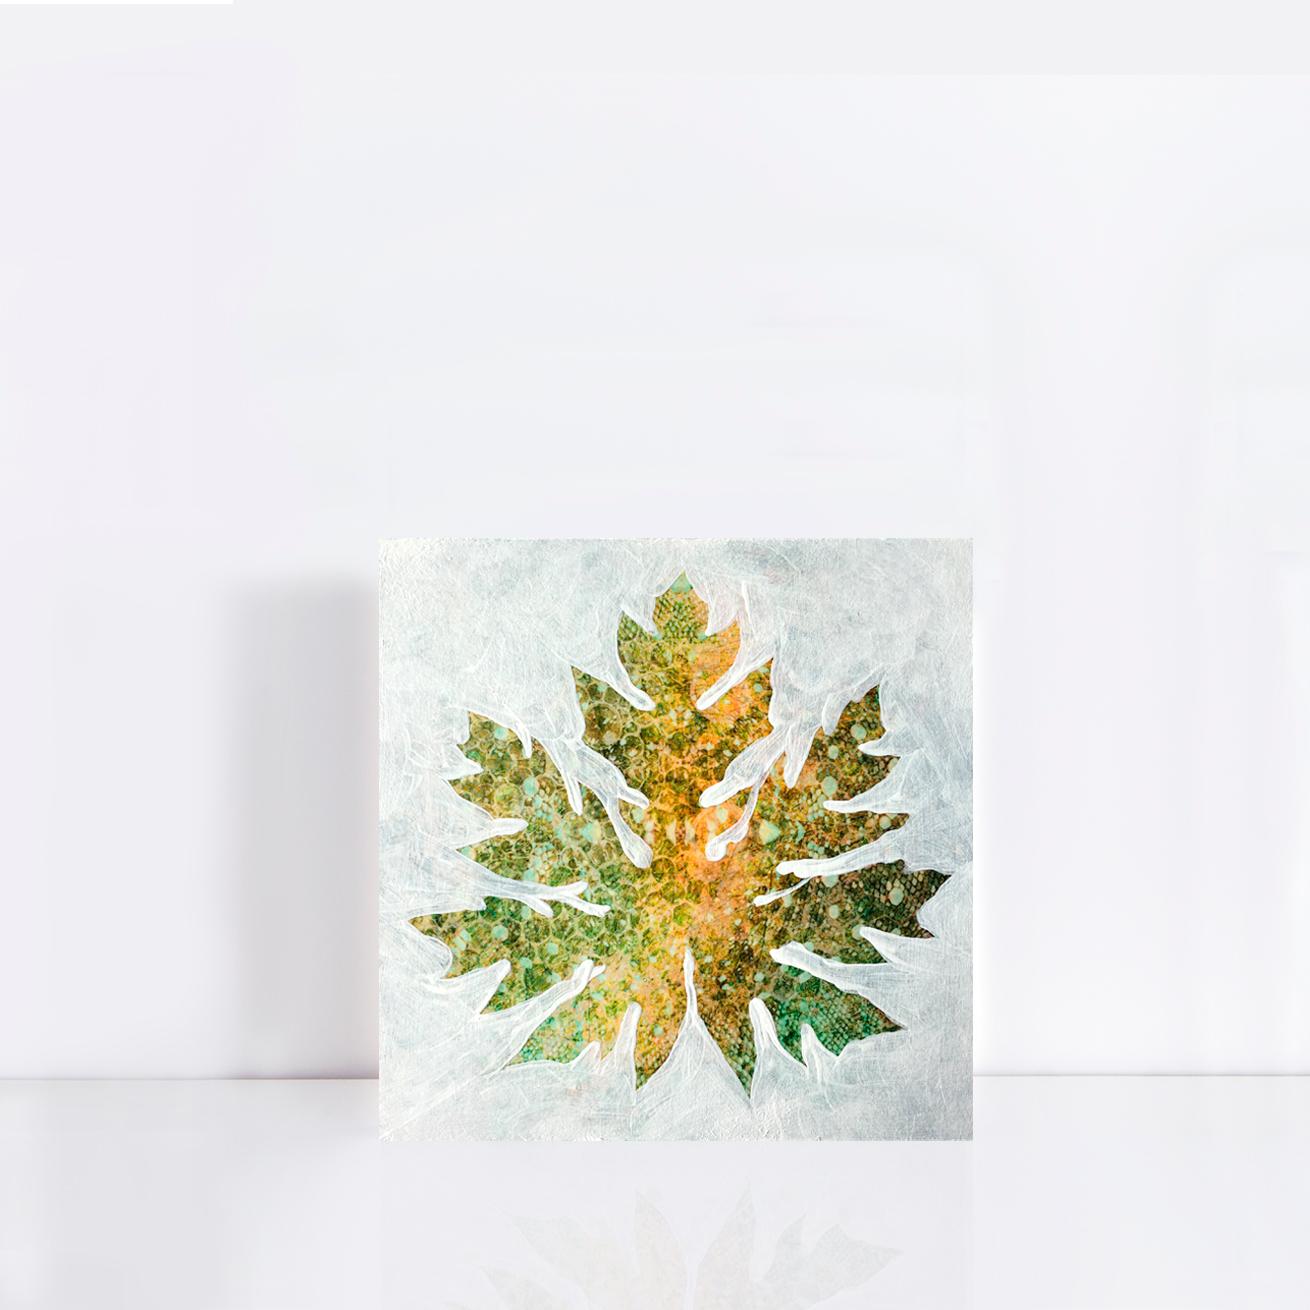 fineart-patterned-leaf-3f